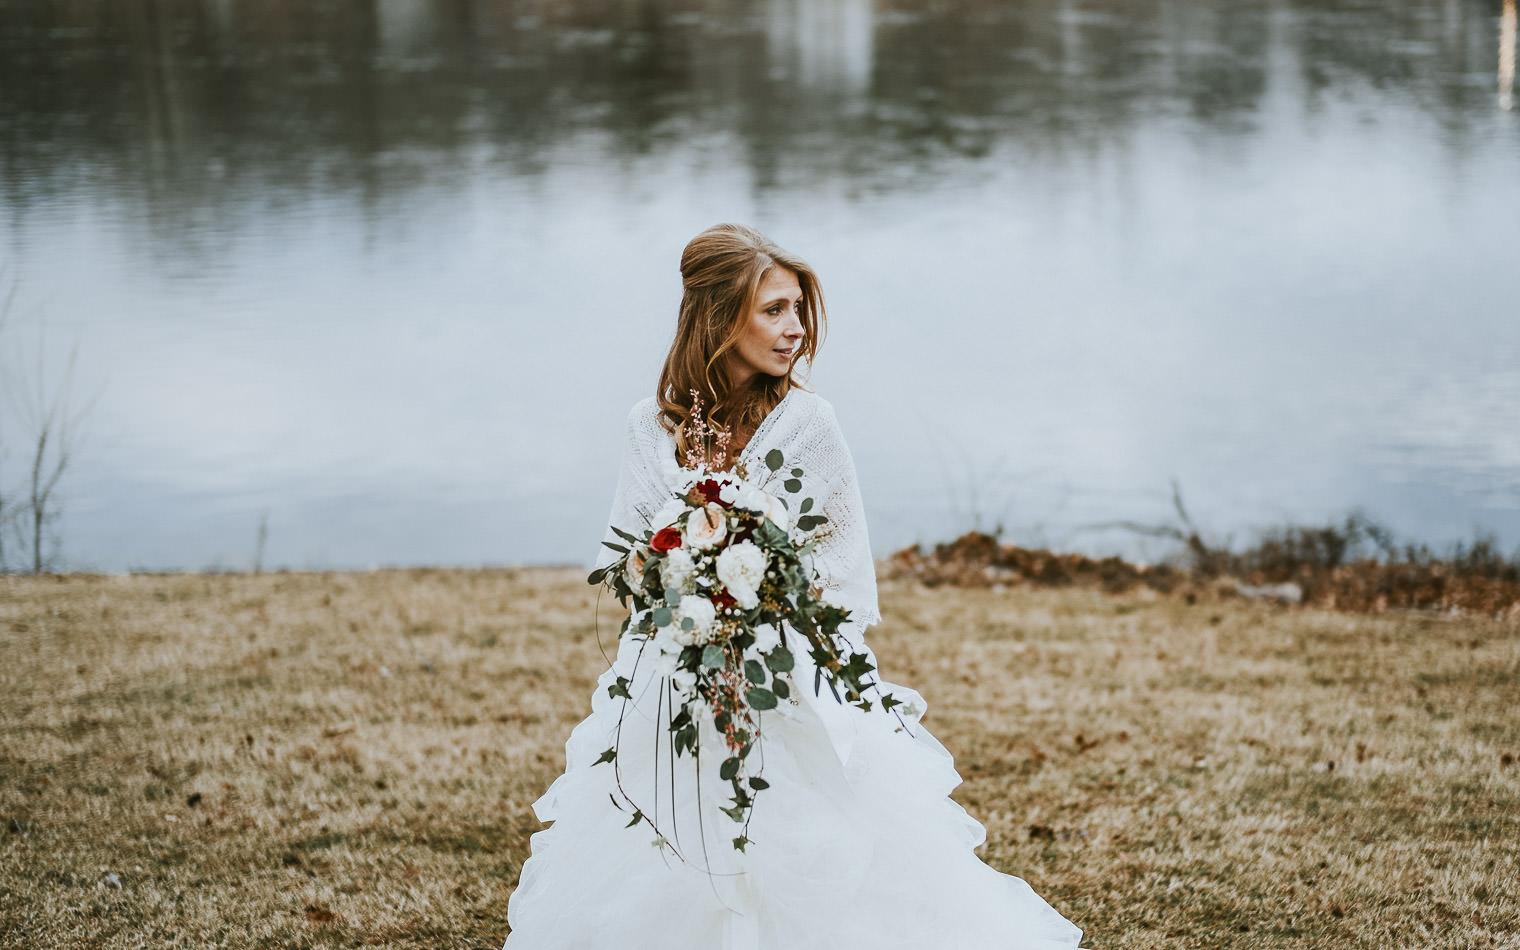 Jay-Cassario-Leica-Wedding-18.jpg